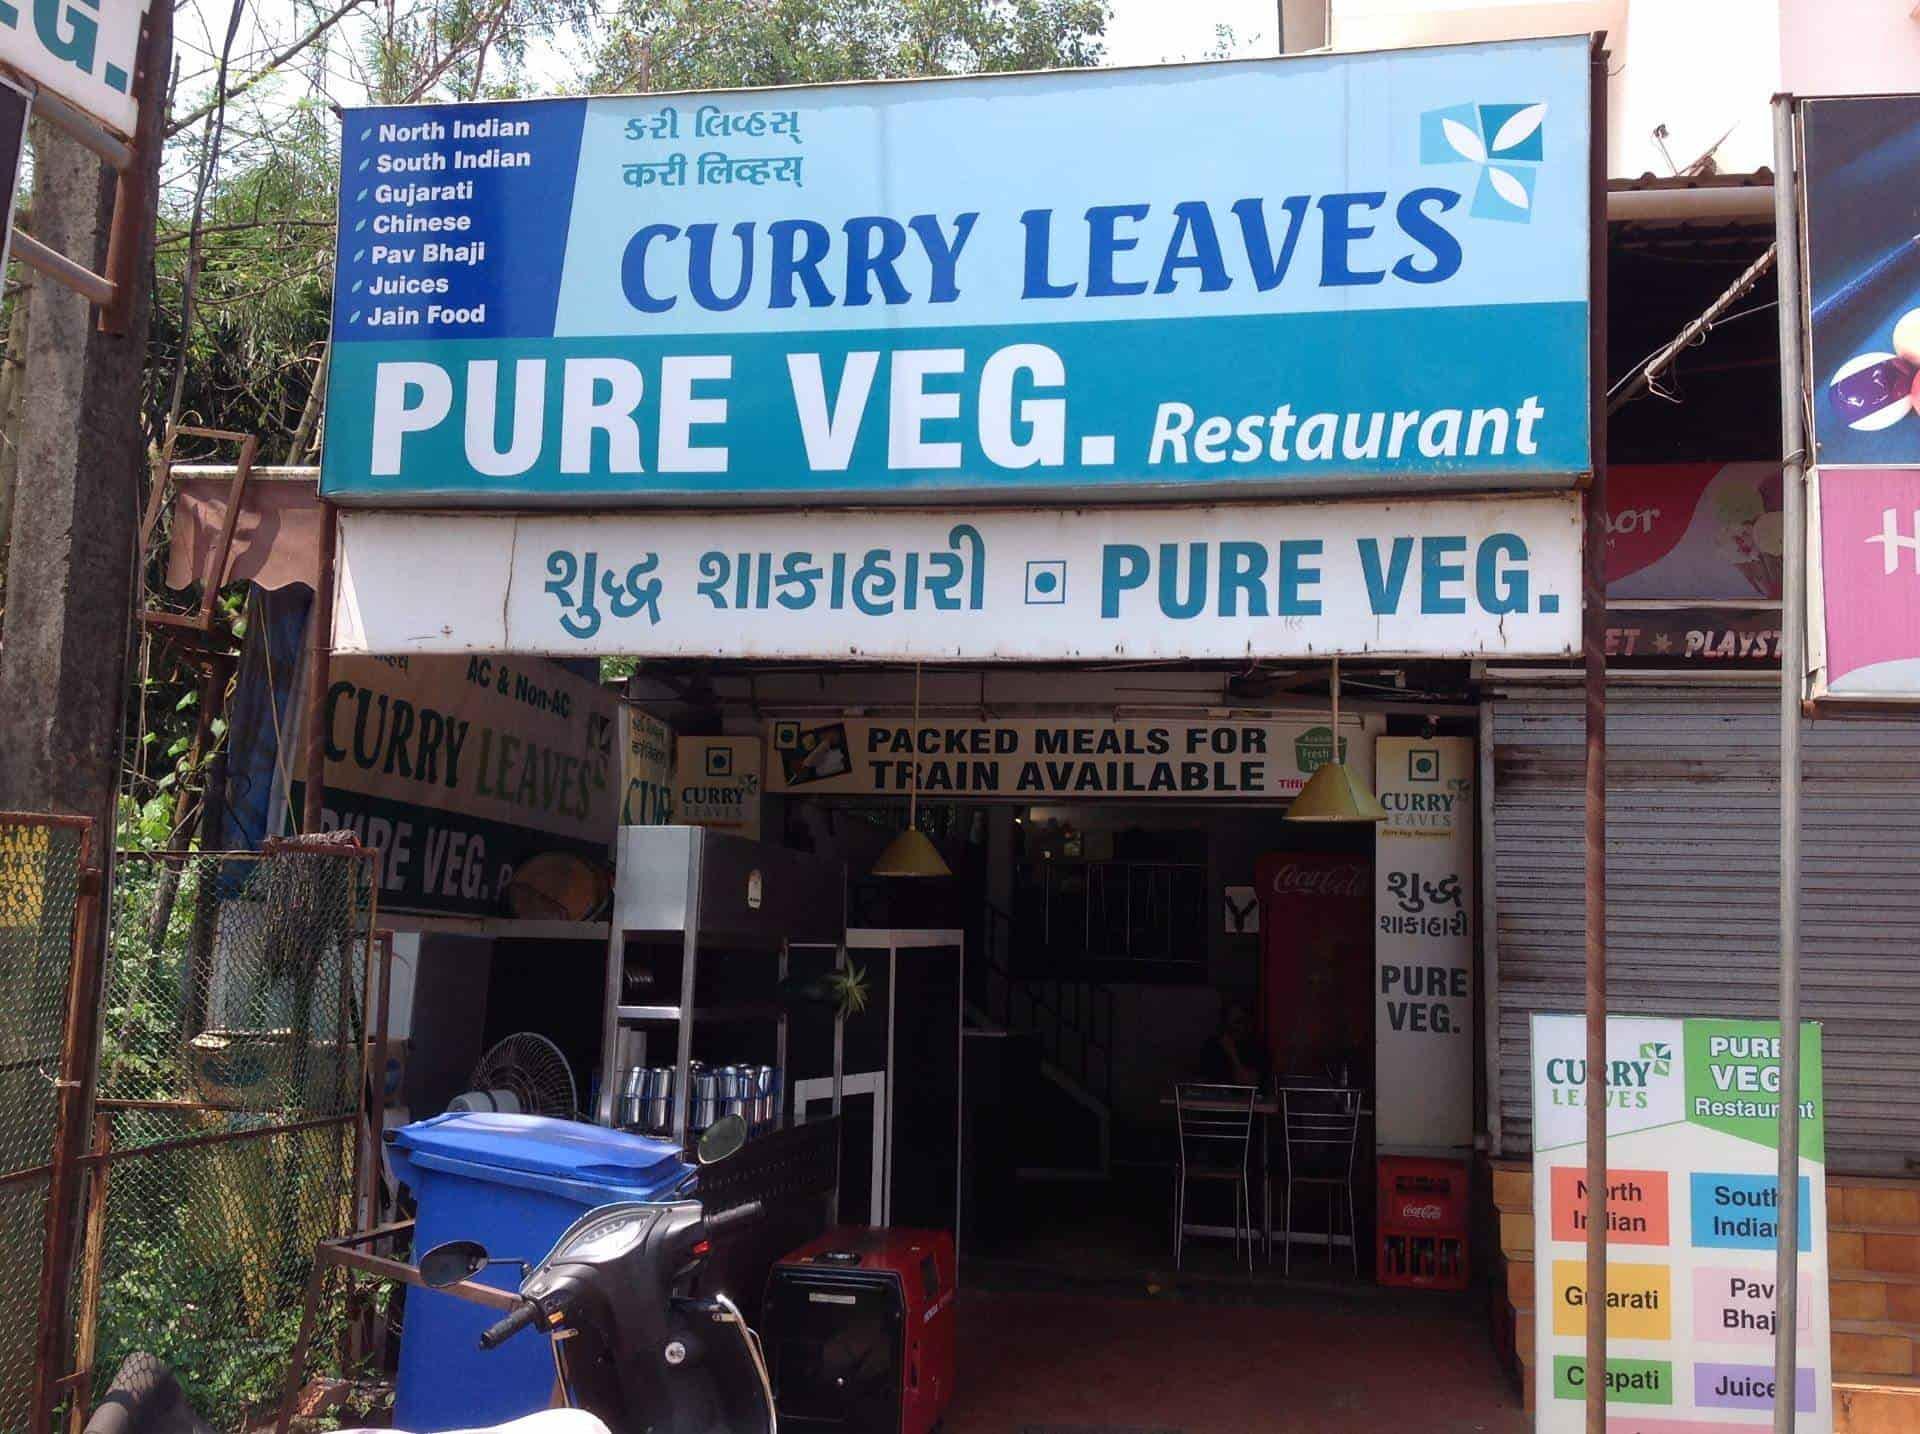 Curry Leaves Pure Veg Restaurant Closed Down Calangute Goa Indian Chinese Punjabi Gujarati North Indian South Indian Pure Vegetarian Jain Cuisine Restaurant Justdial